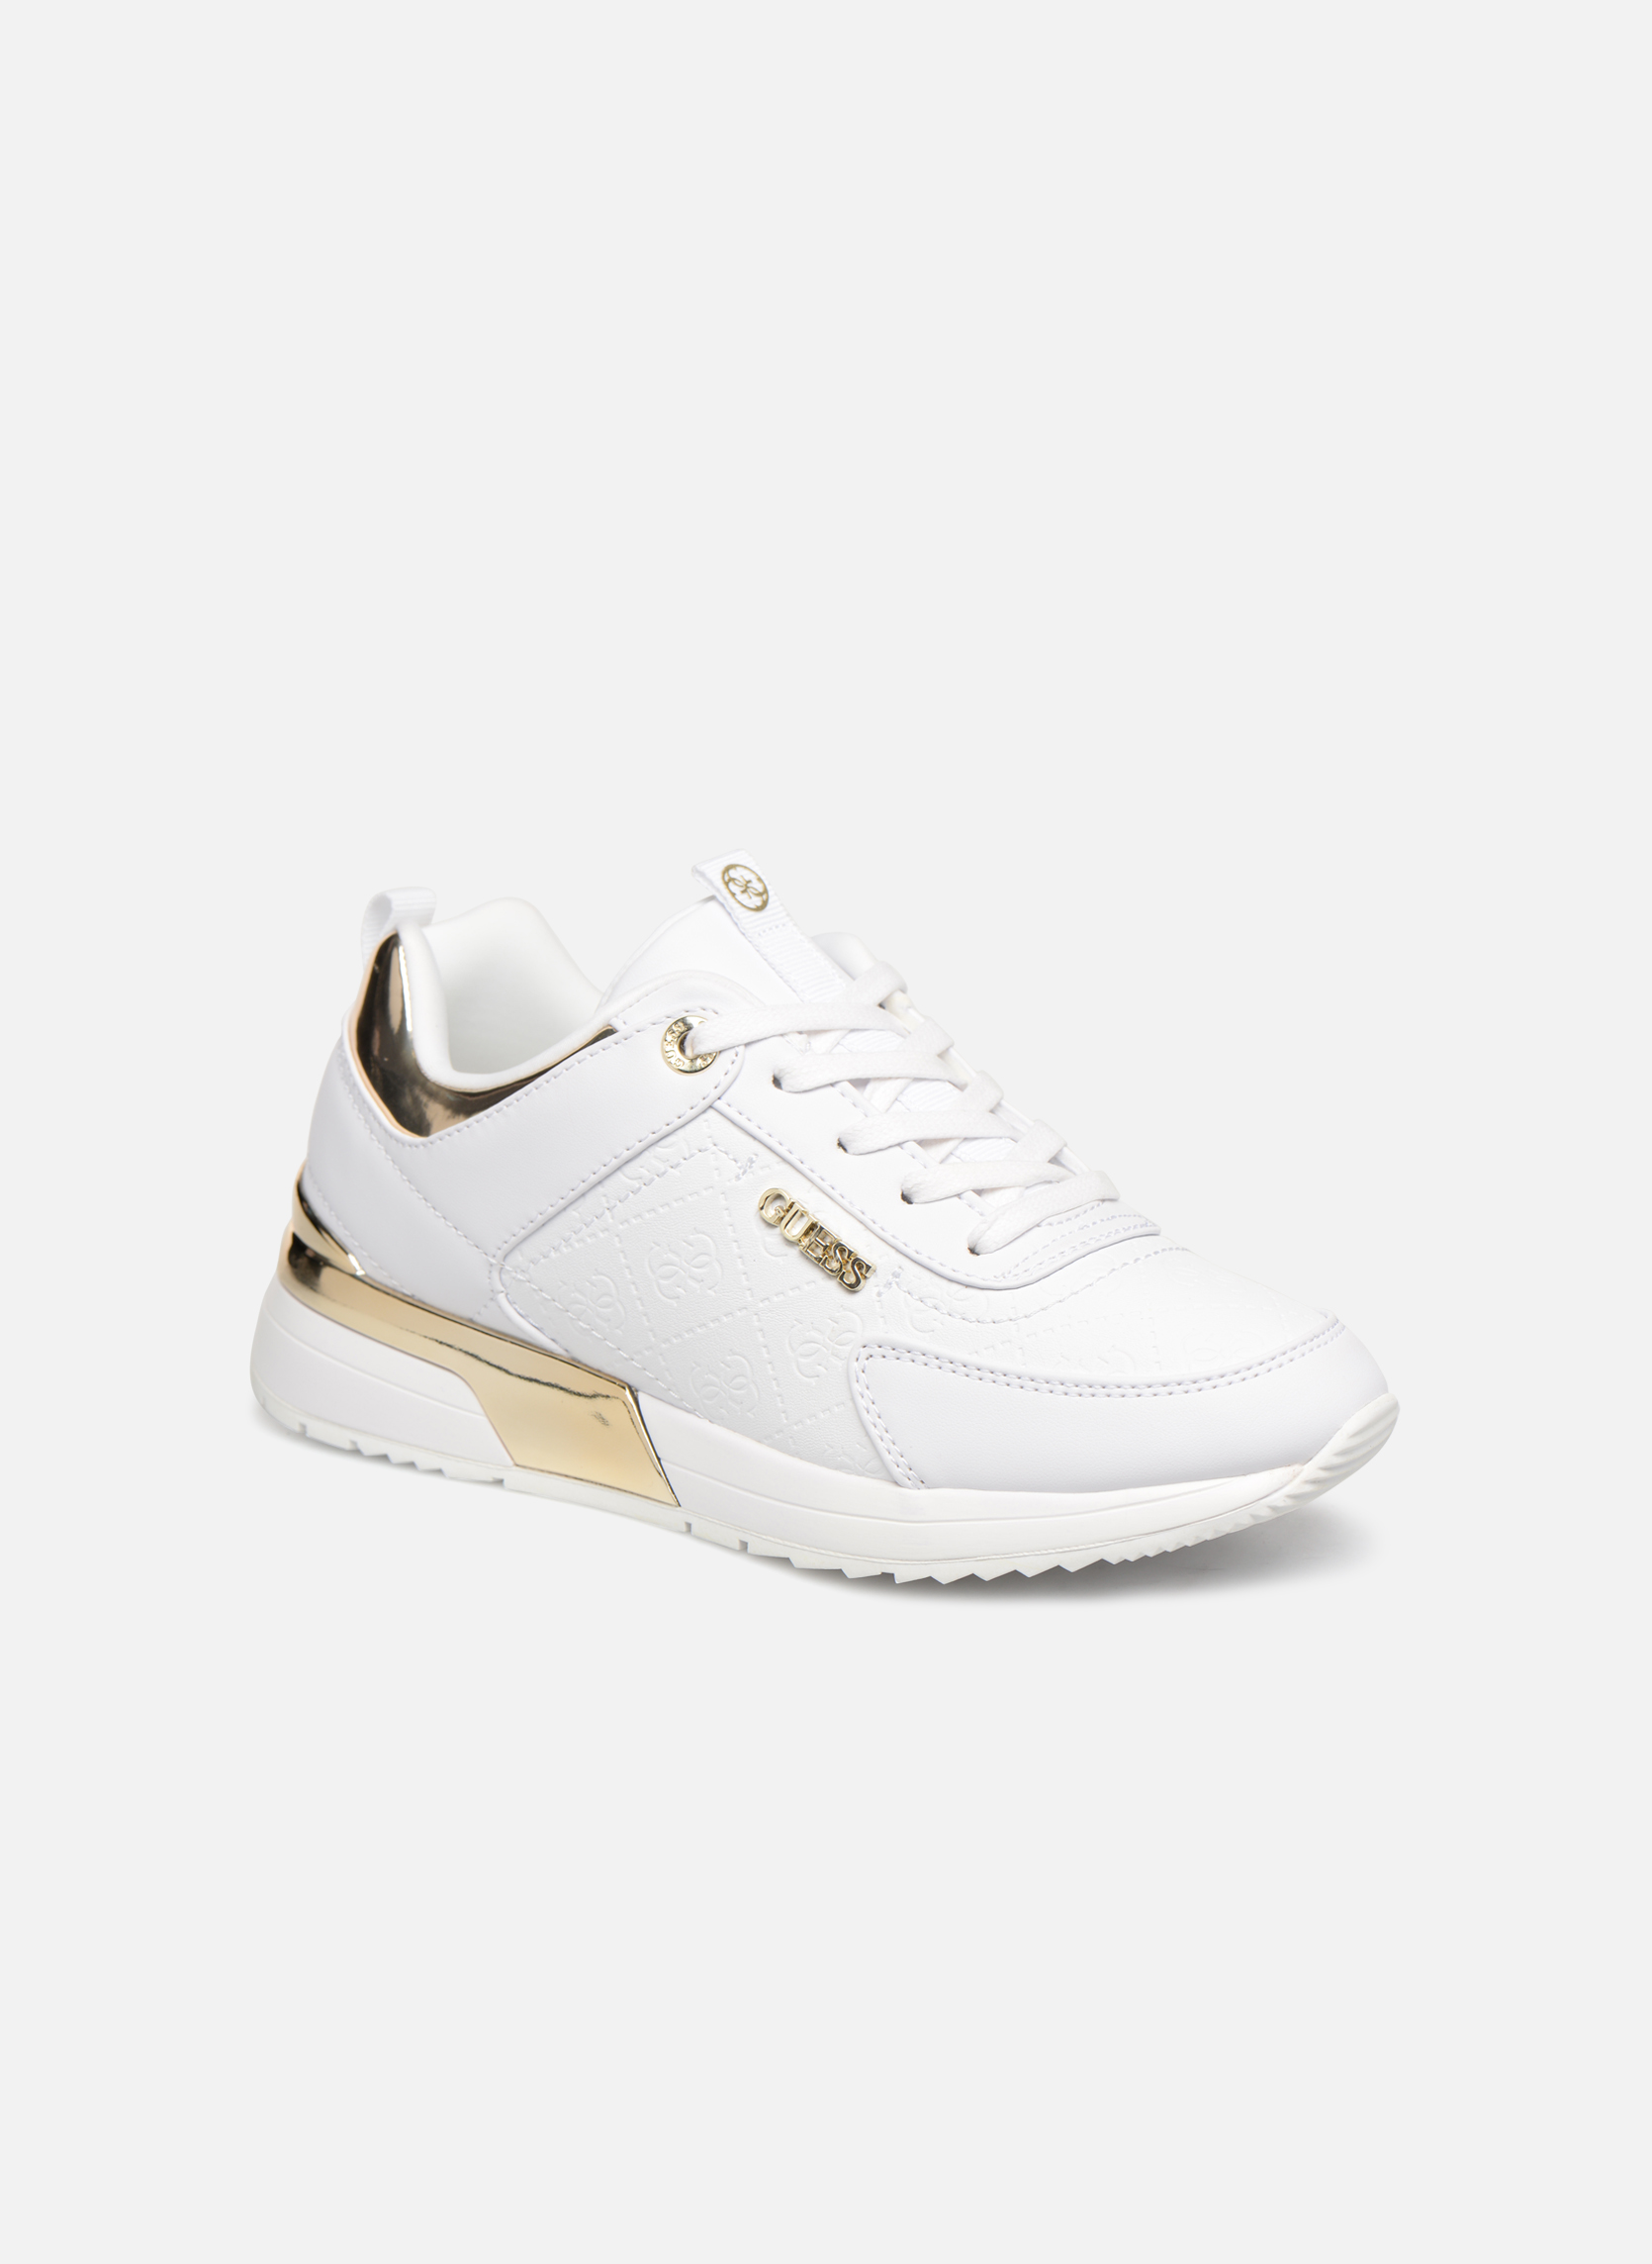 Sneakers van Guess maat 41 Tot € 175 , | Voordelig via